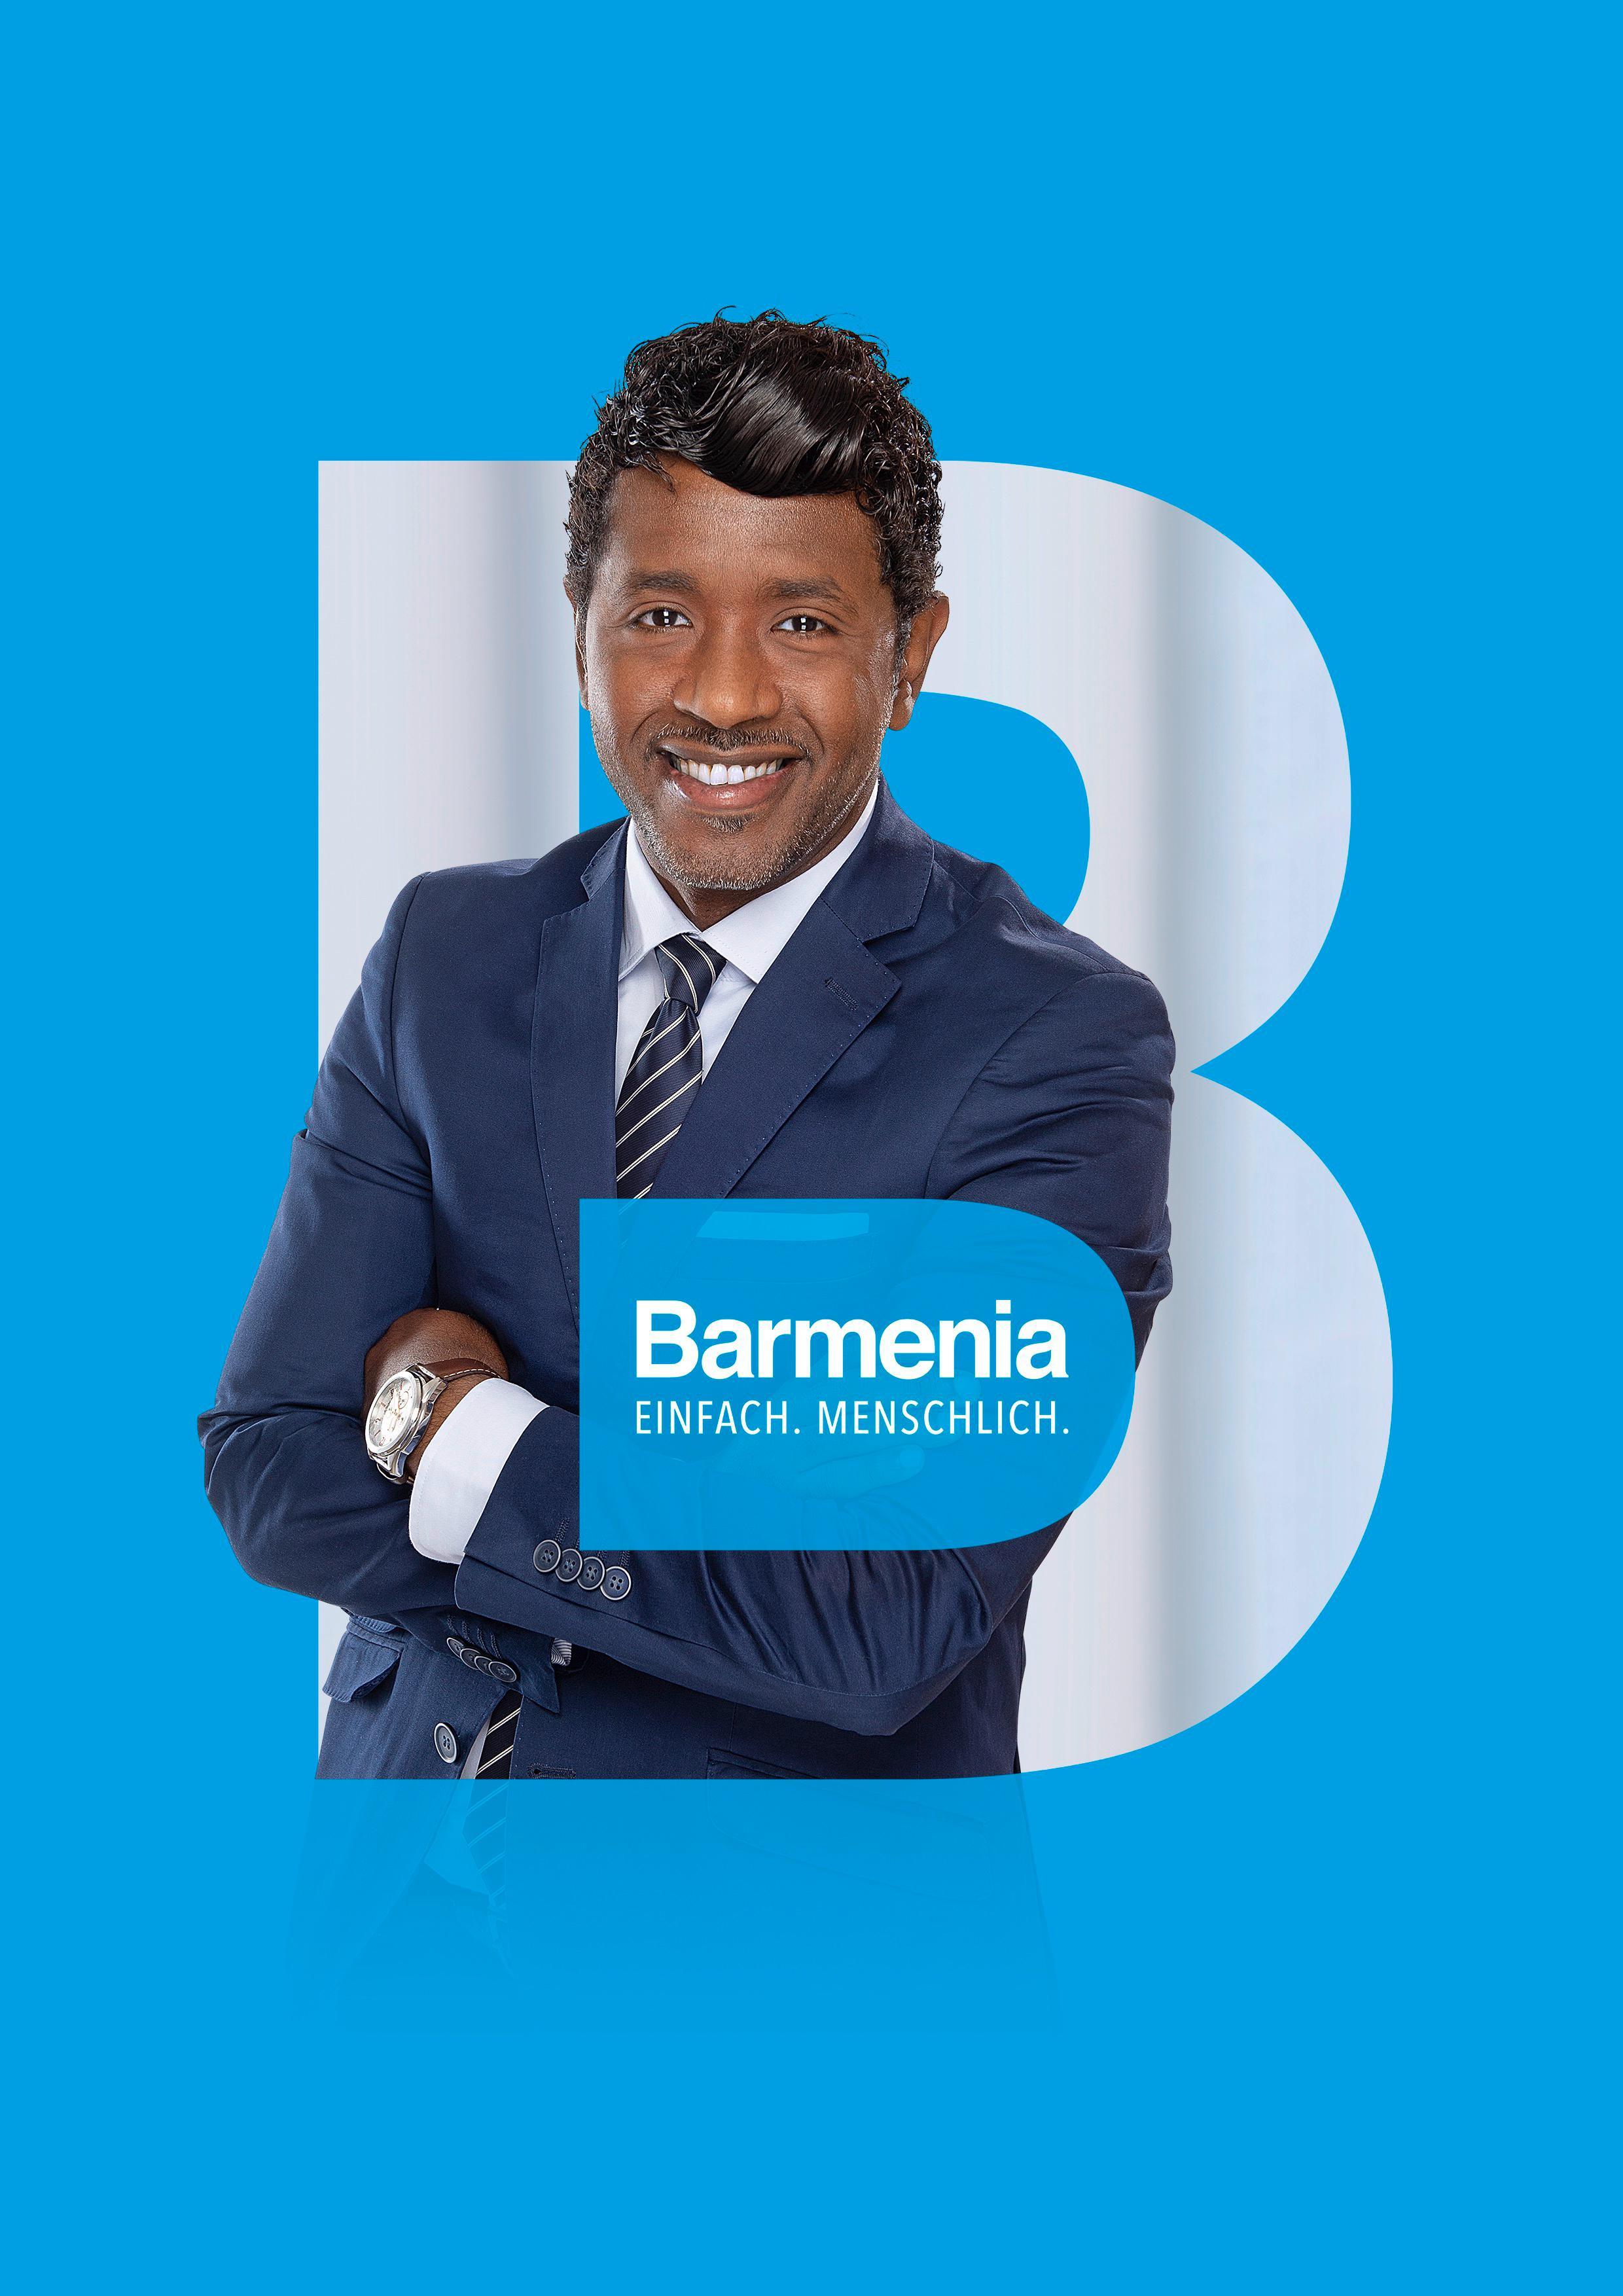 Barmenia Versicherung - Ahmed Haji